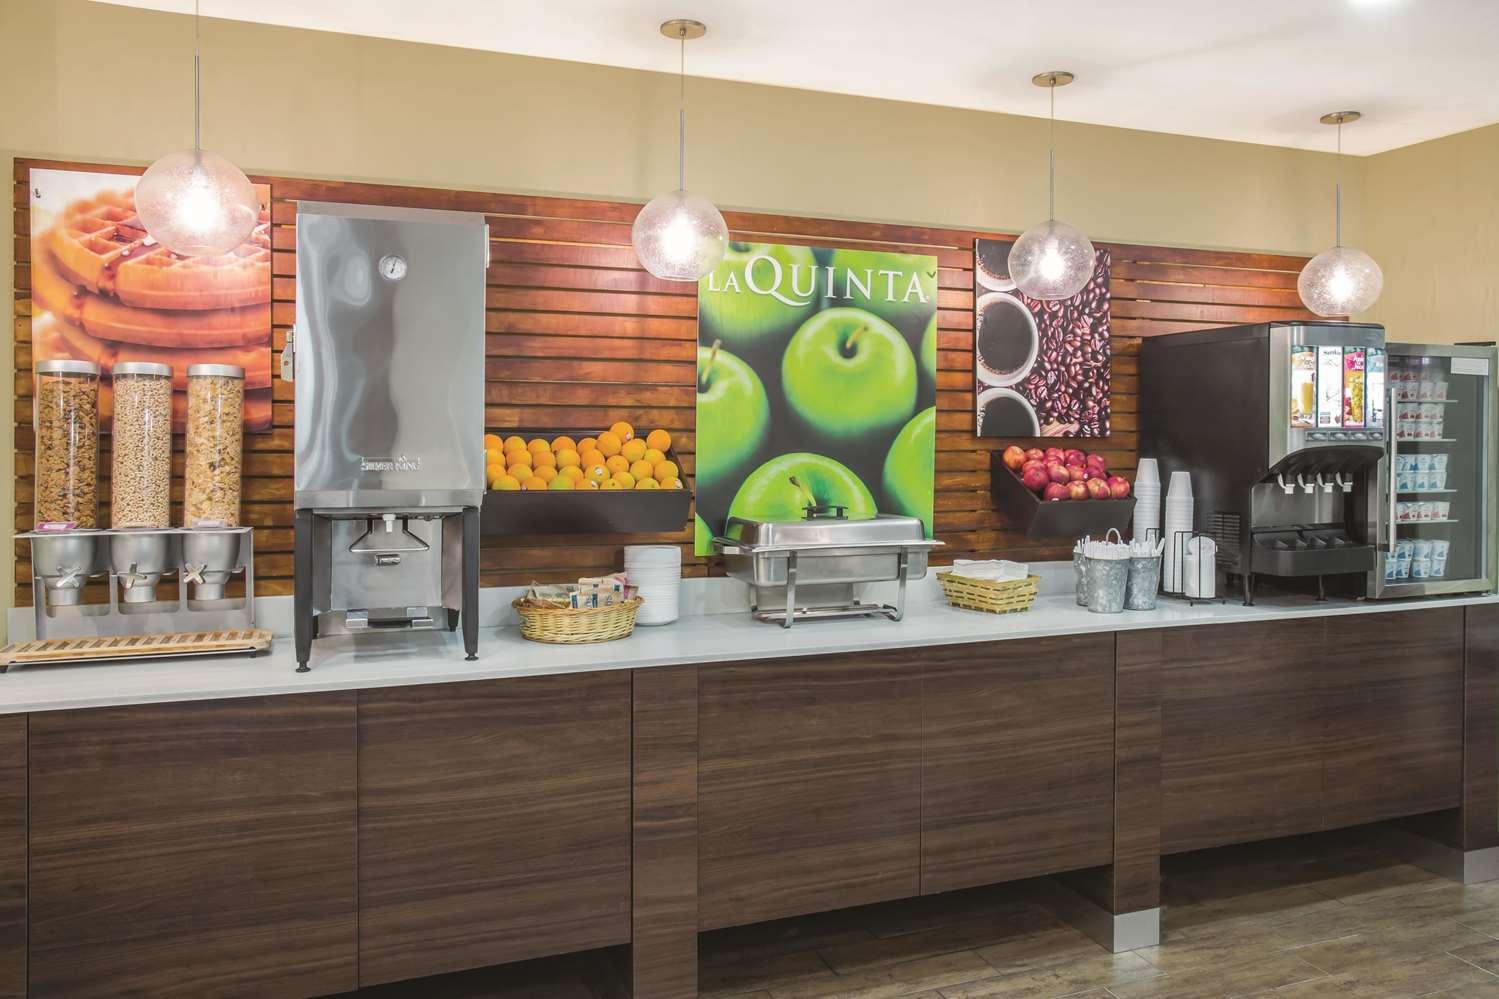 proam - La Quinta Inn & Suites Daytona Beach